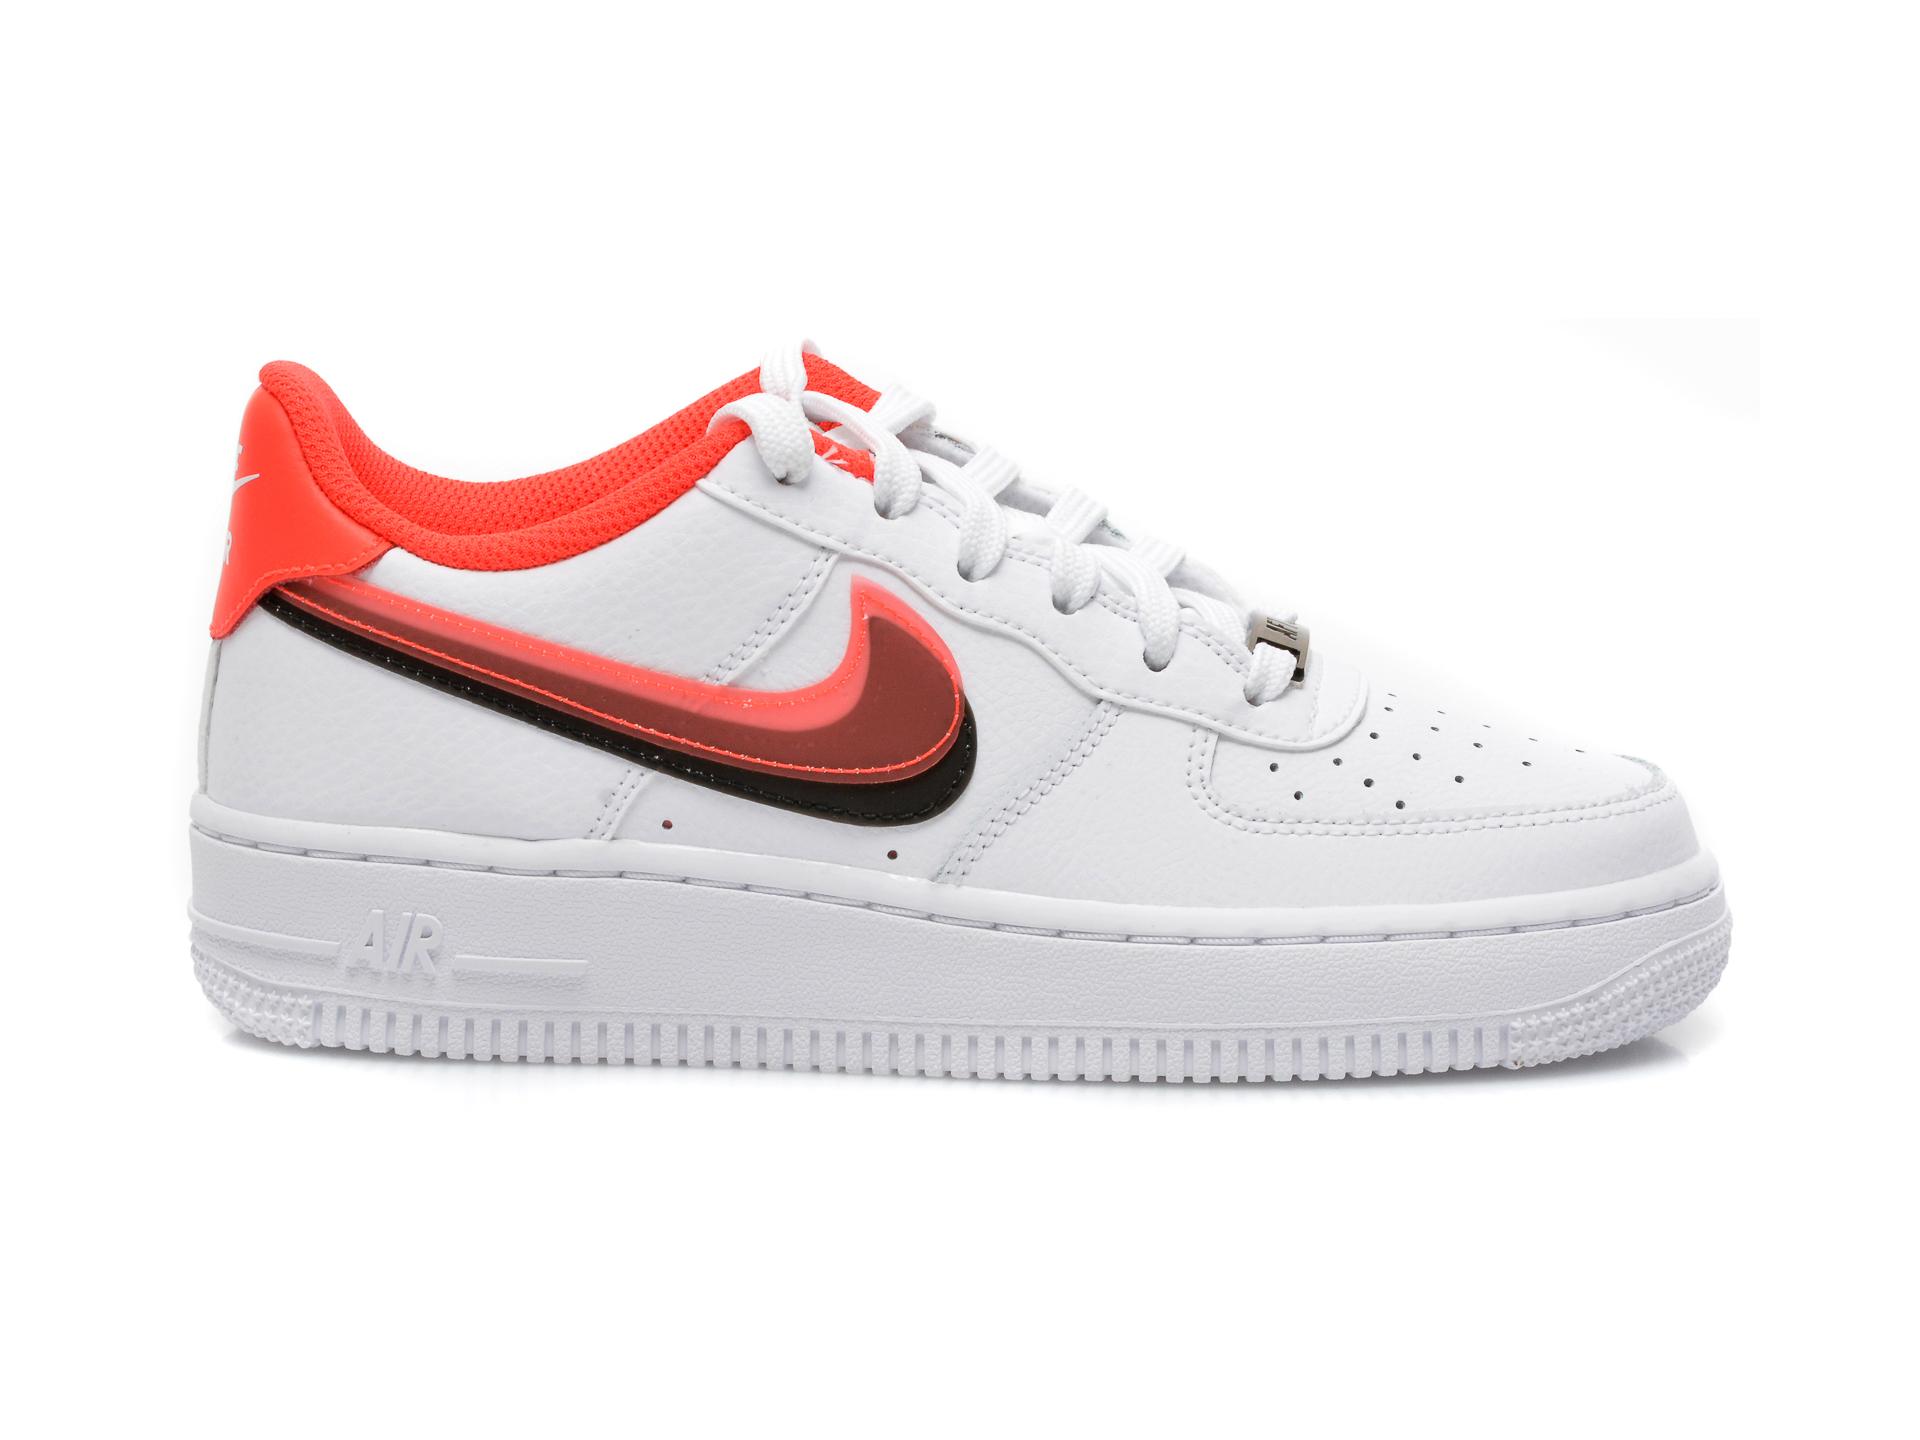 Pantofi sport NIKE albi, AIR FORCE 1 LV8 (GS), din piele naturala - 1